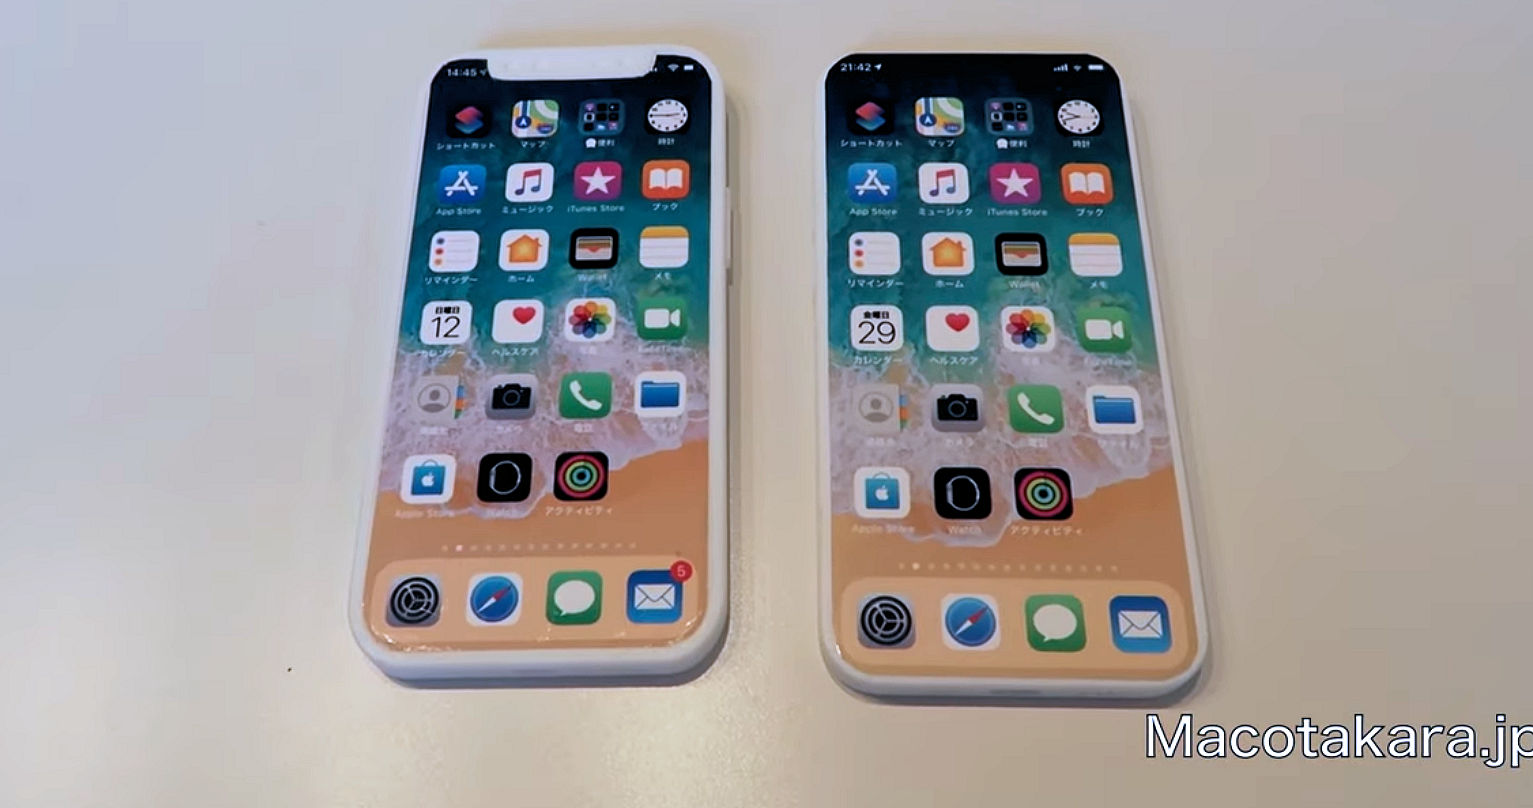 Prototyp iPhone 13 vraj už má USB-C port